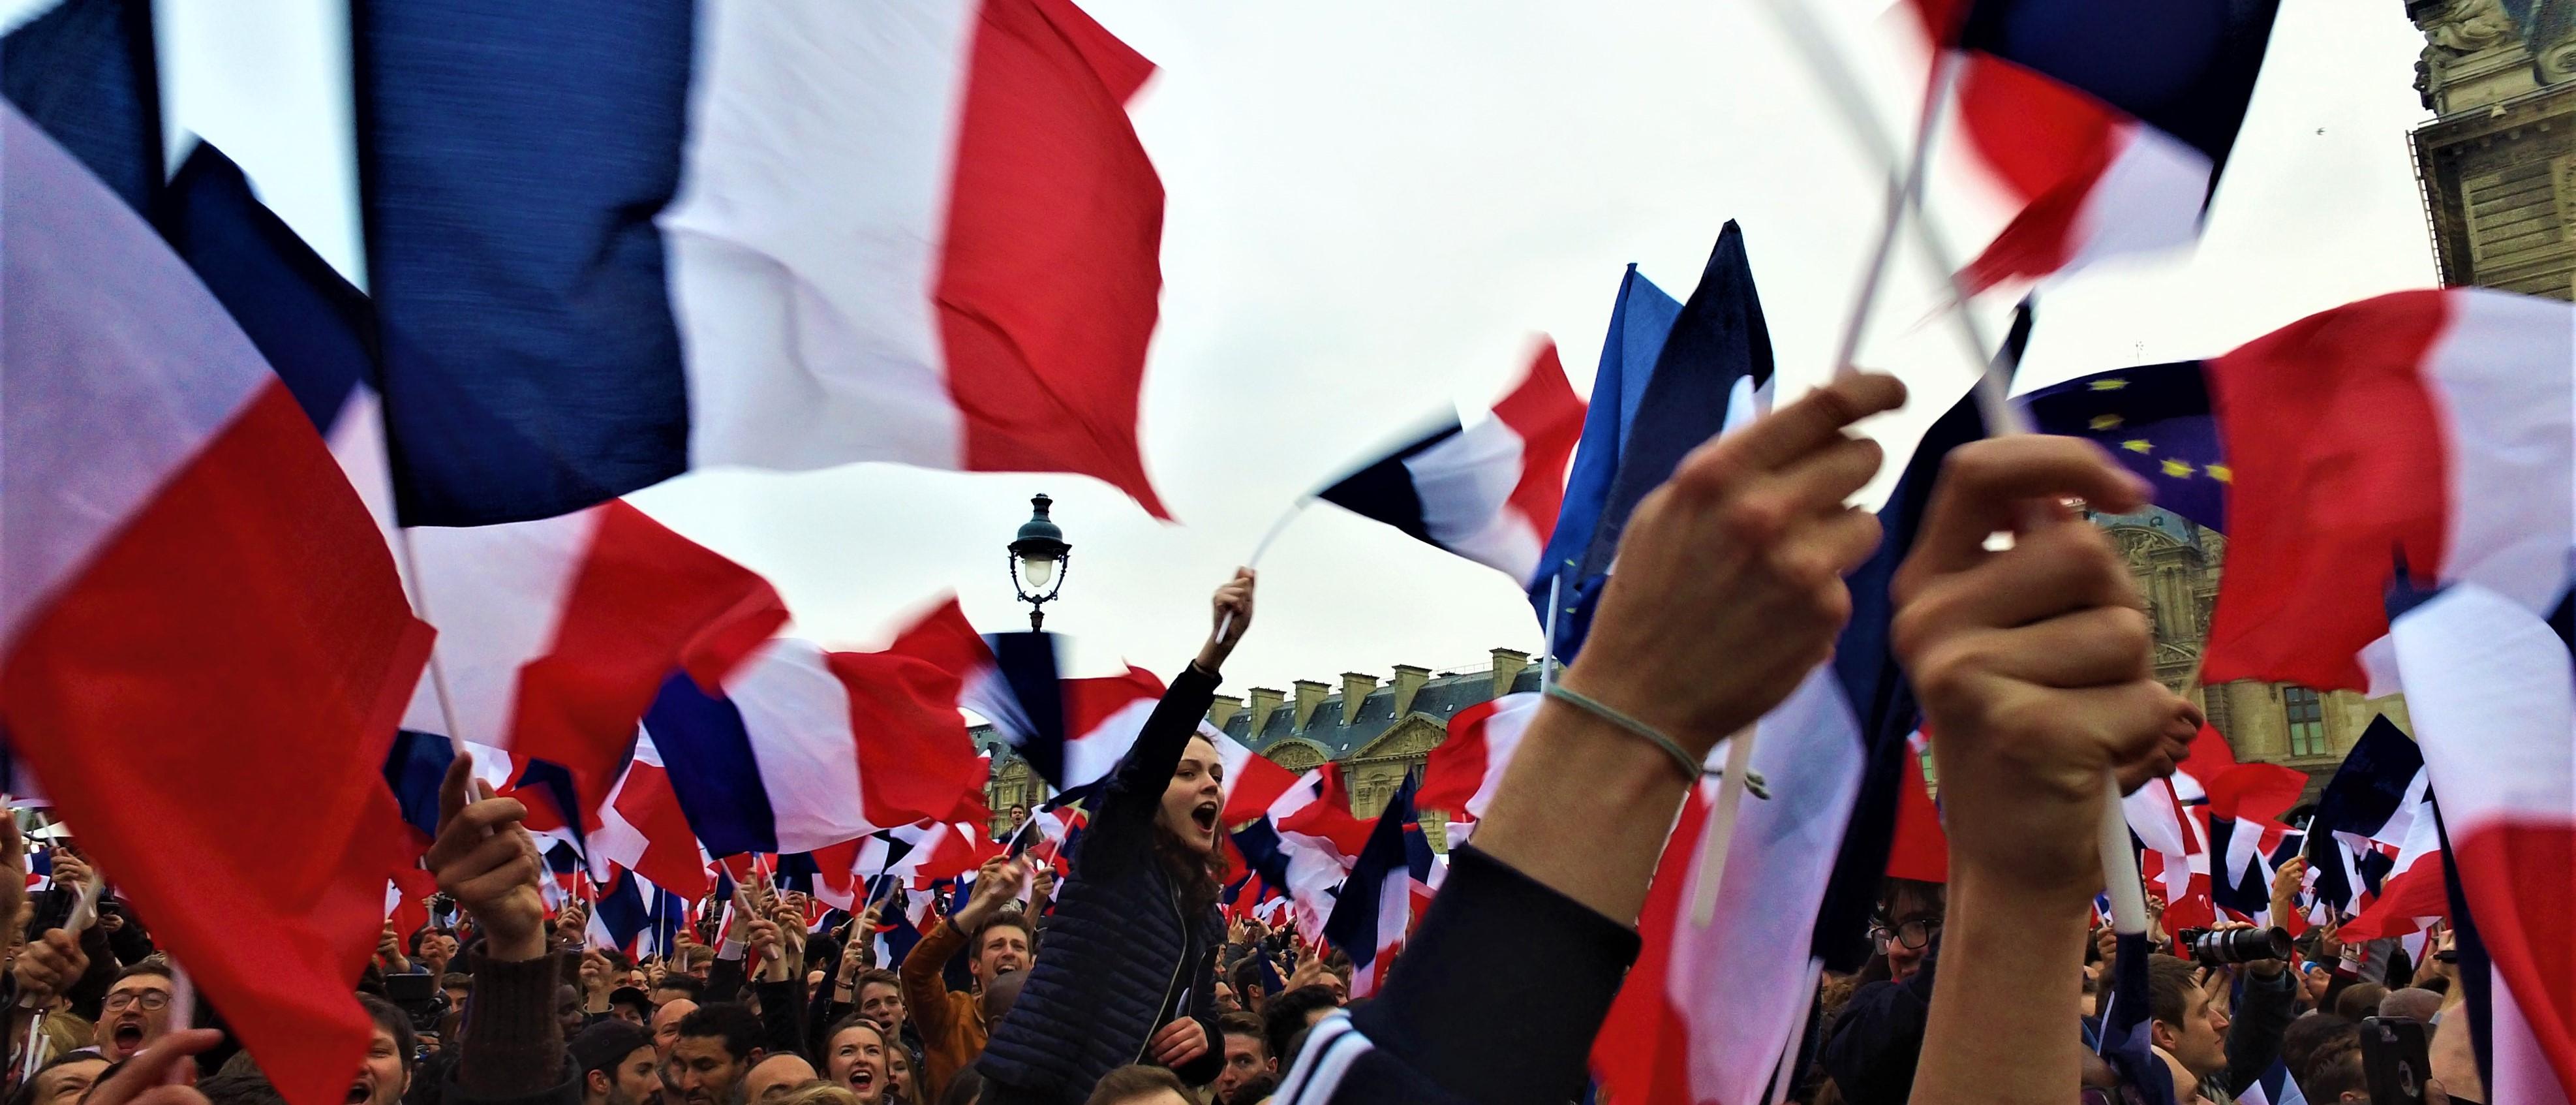 france macron meeting 1 - 「希望」だけが足りない、日本のポピュリズム